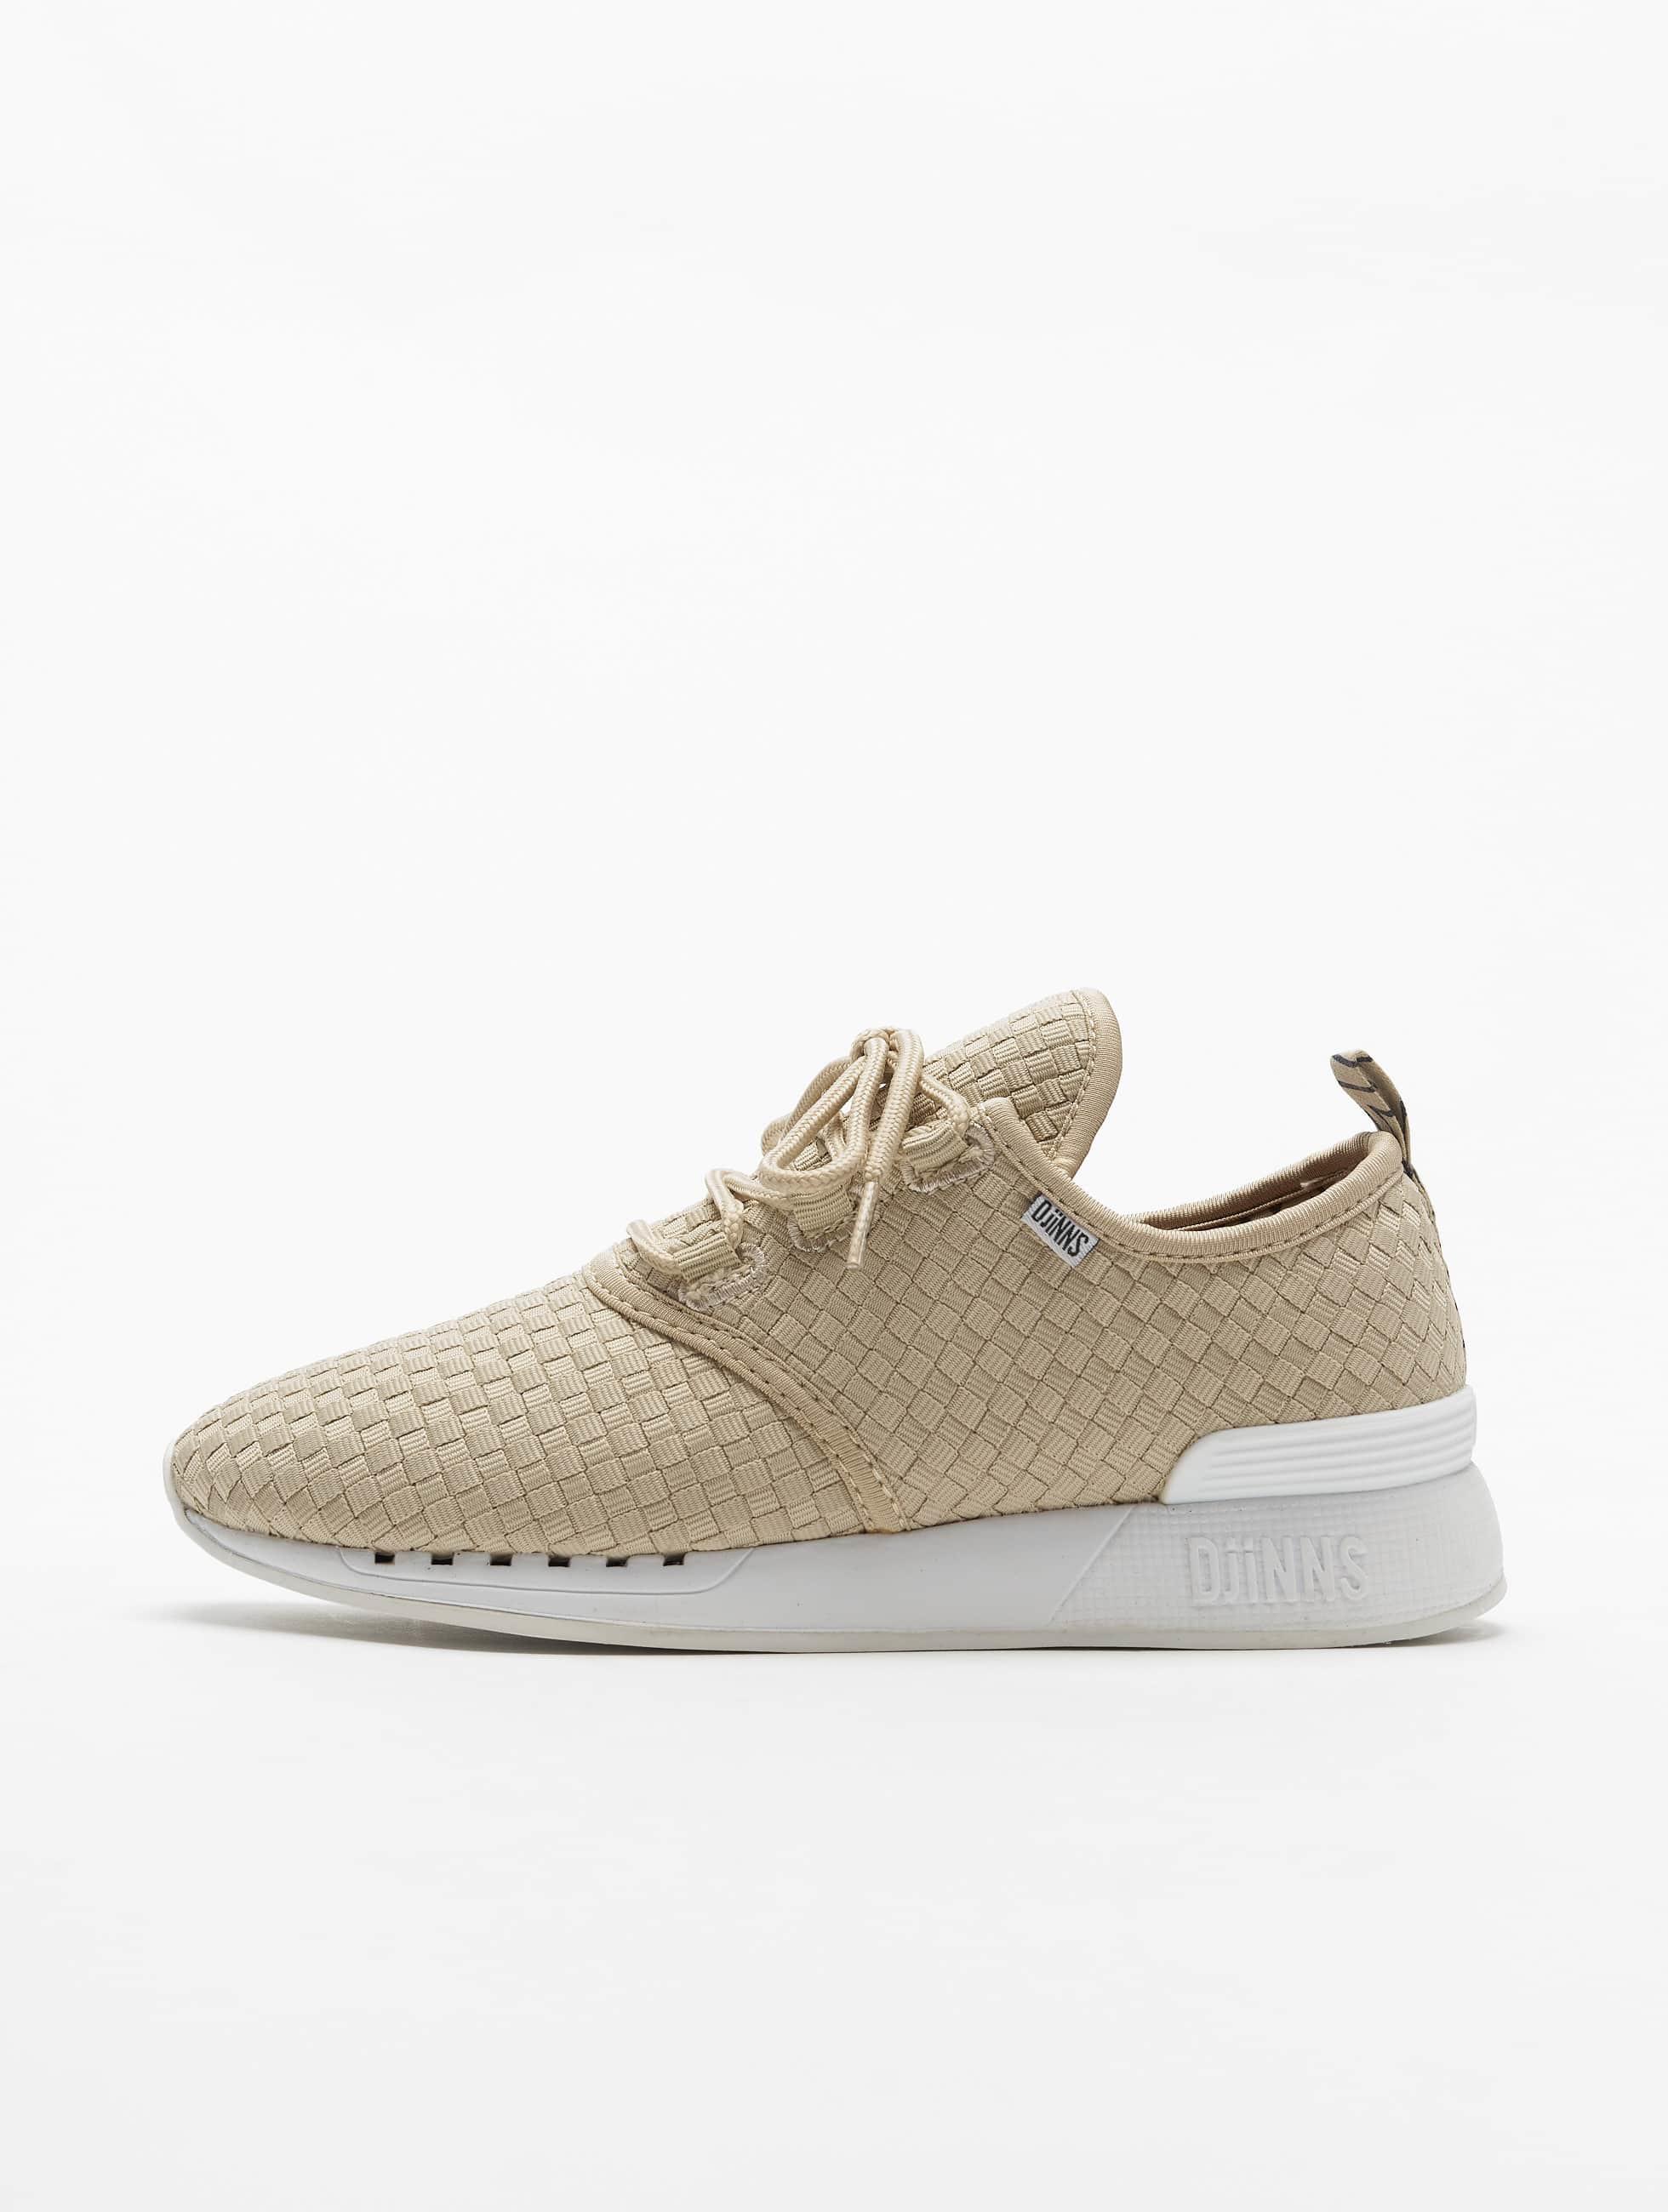 Djinns Chaussures / Baskets Moc Lau Conlines en beige